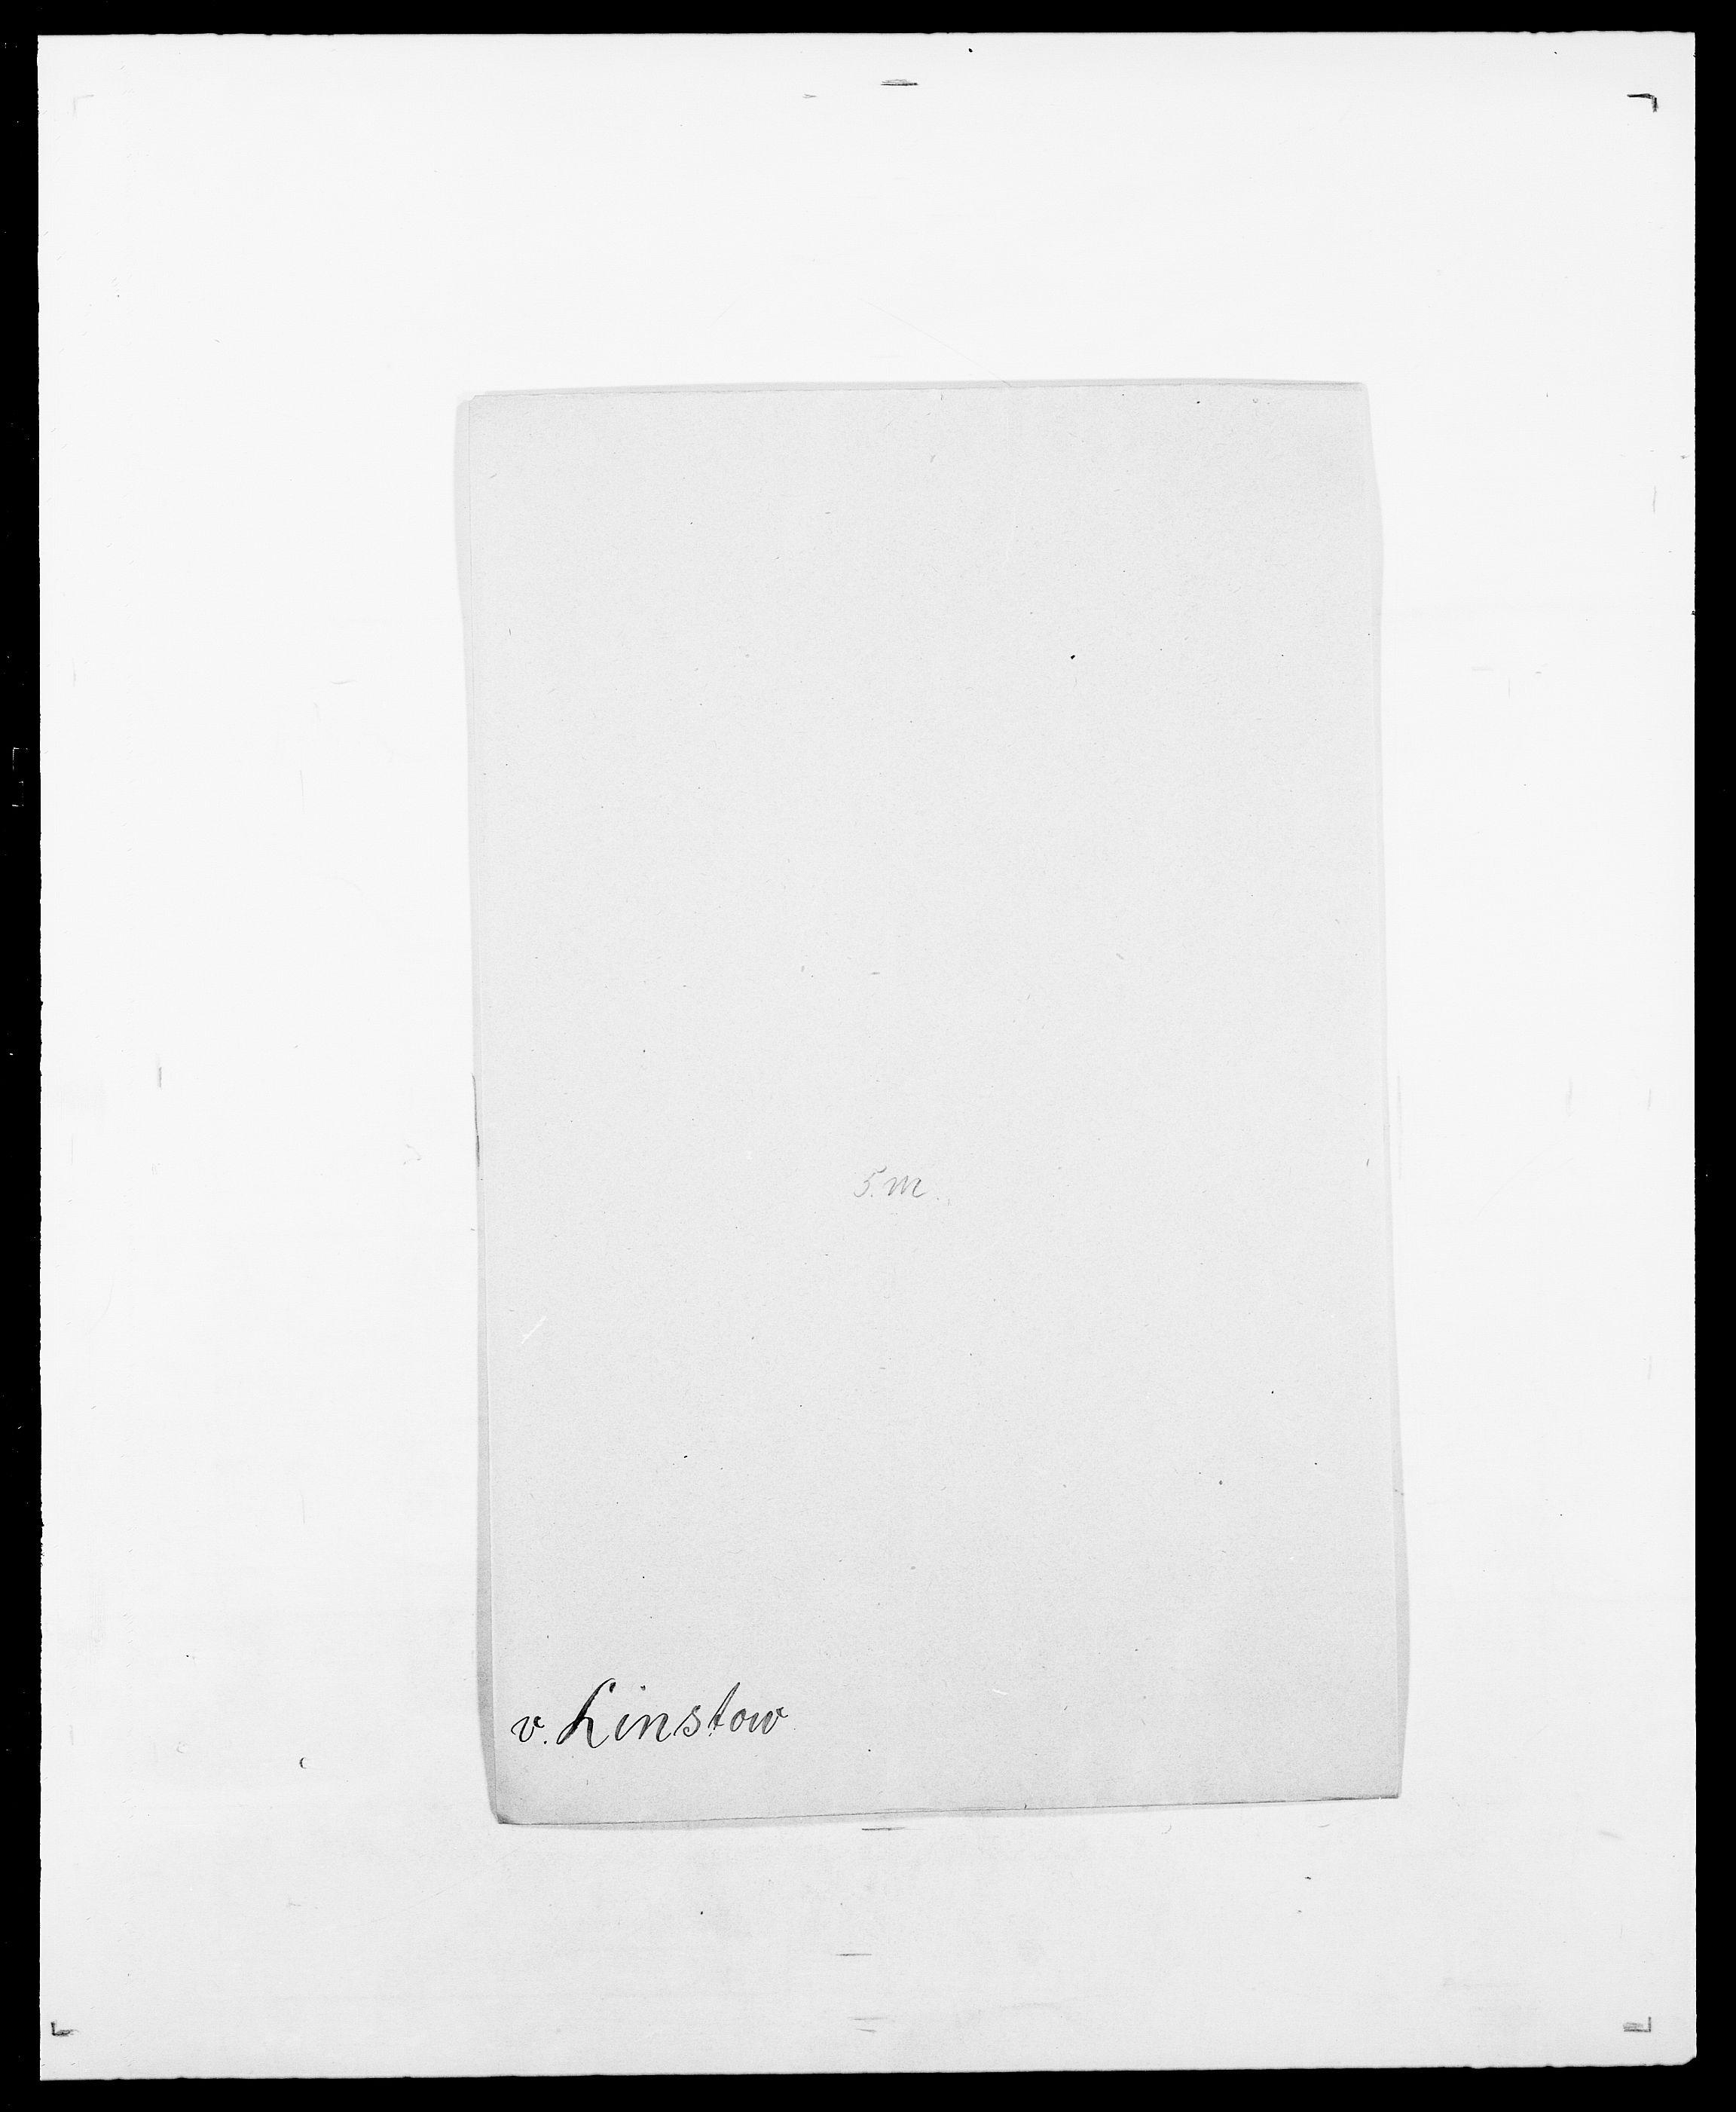 SAO, Delgobe, Charles Antoine - samling, D/Da/L0023: Lau - Lirvyn, s. 666